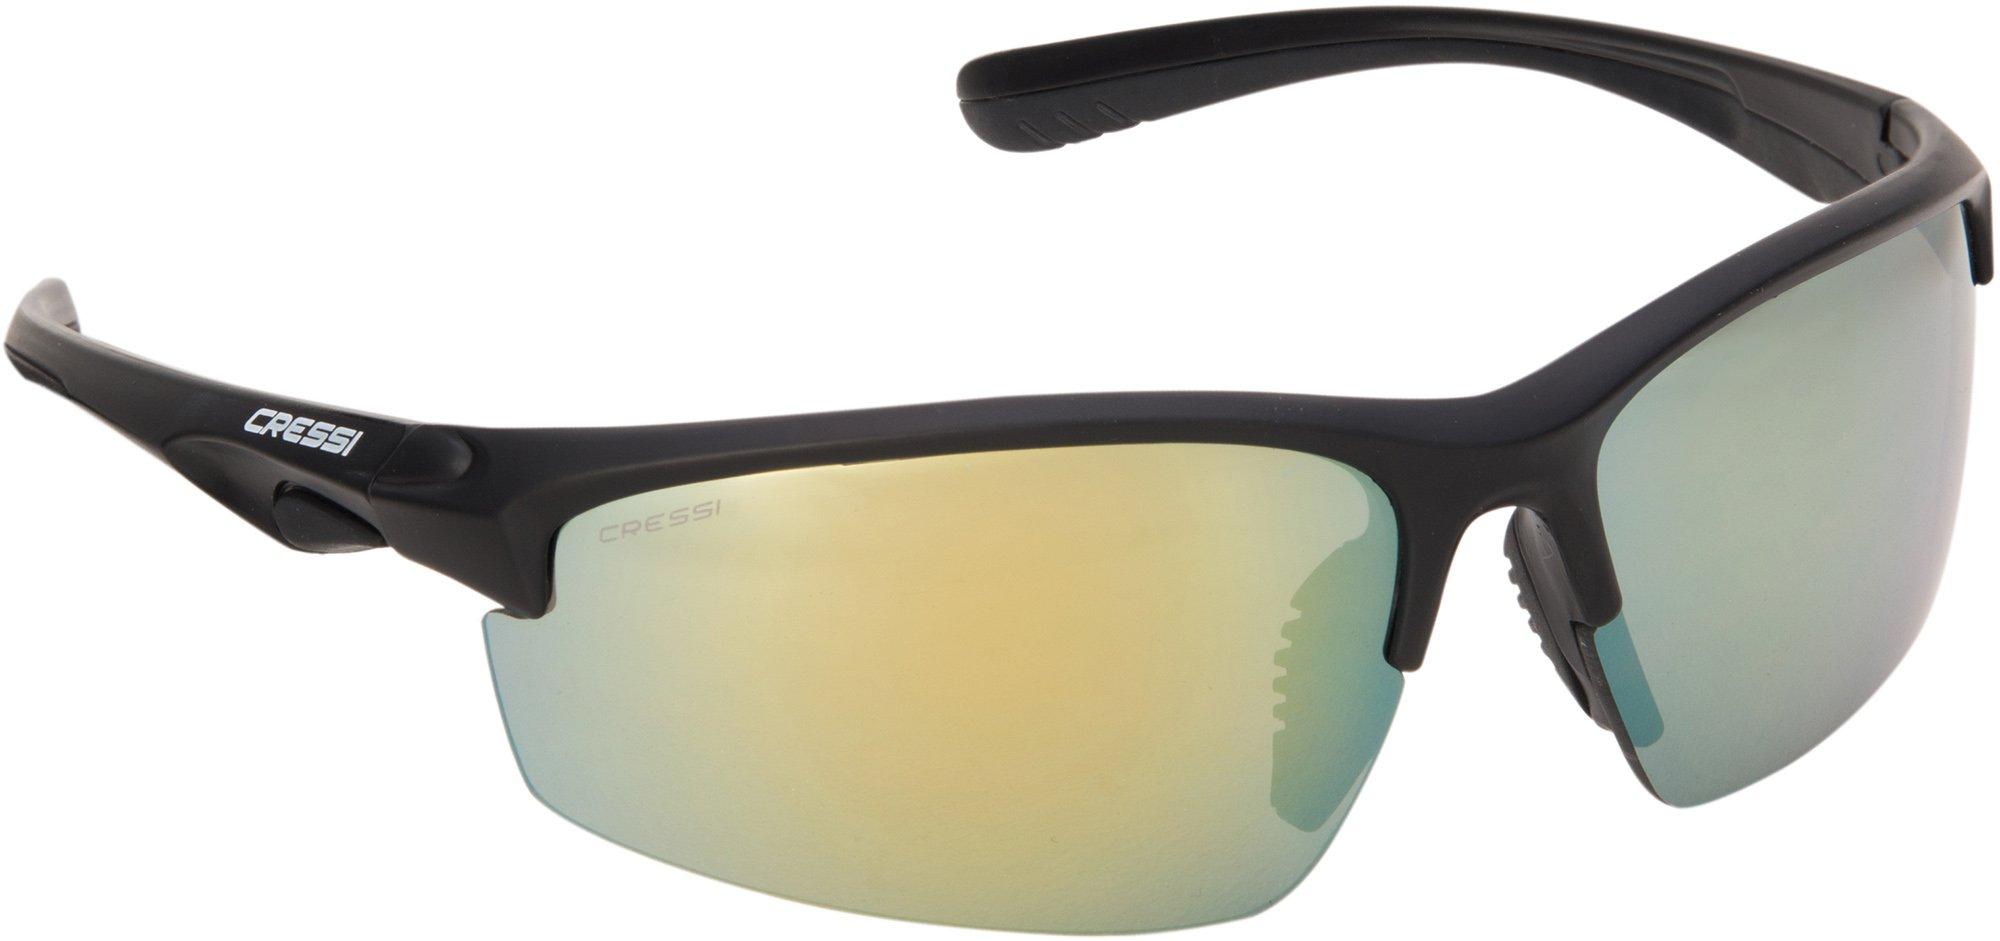 Cressi Unisex Adult Rocky Sunglasses Sports Sunglasses With Case